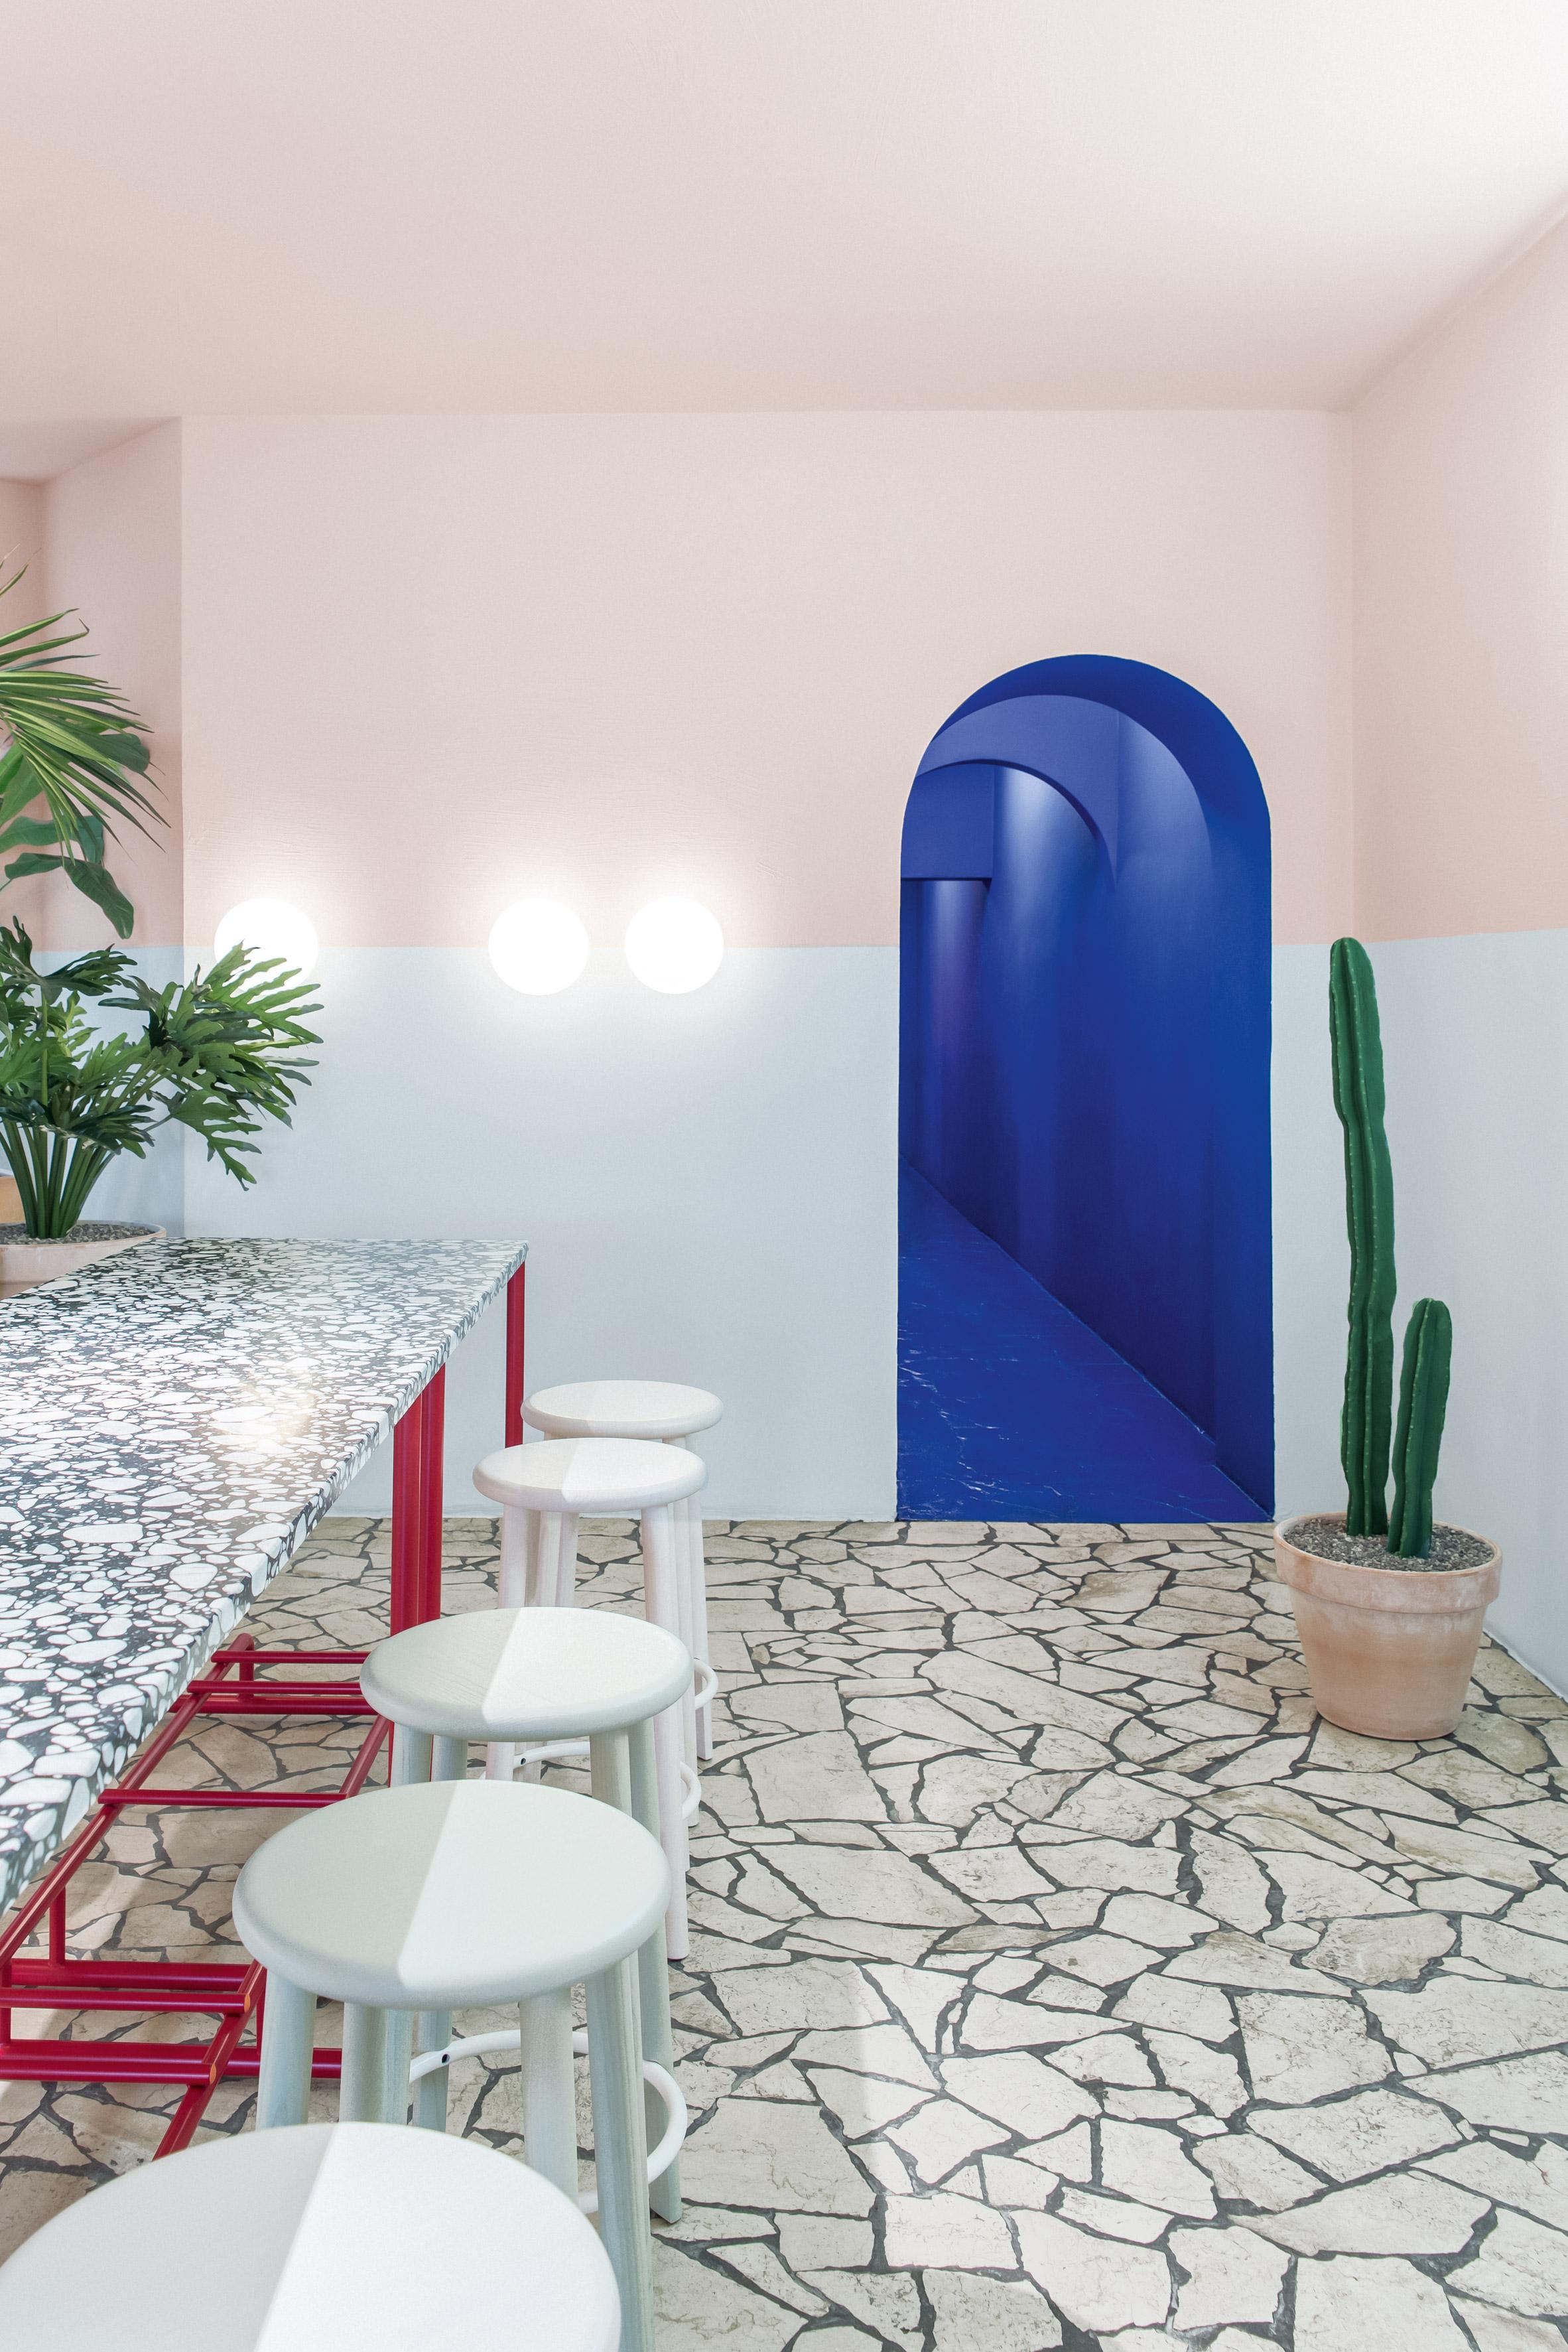 Berlin restaurant LA Poke takes cues from Hockney's A Bigger Splash